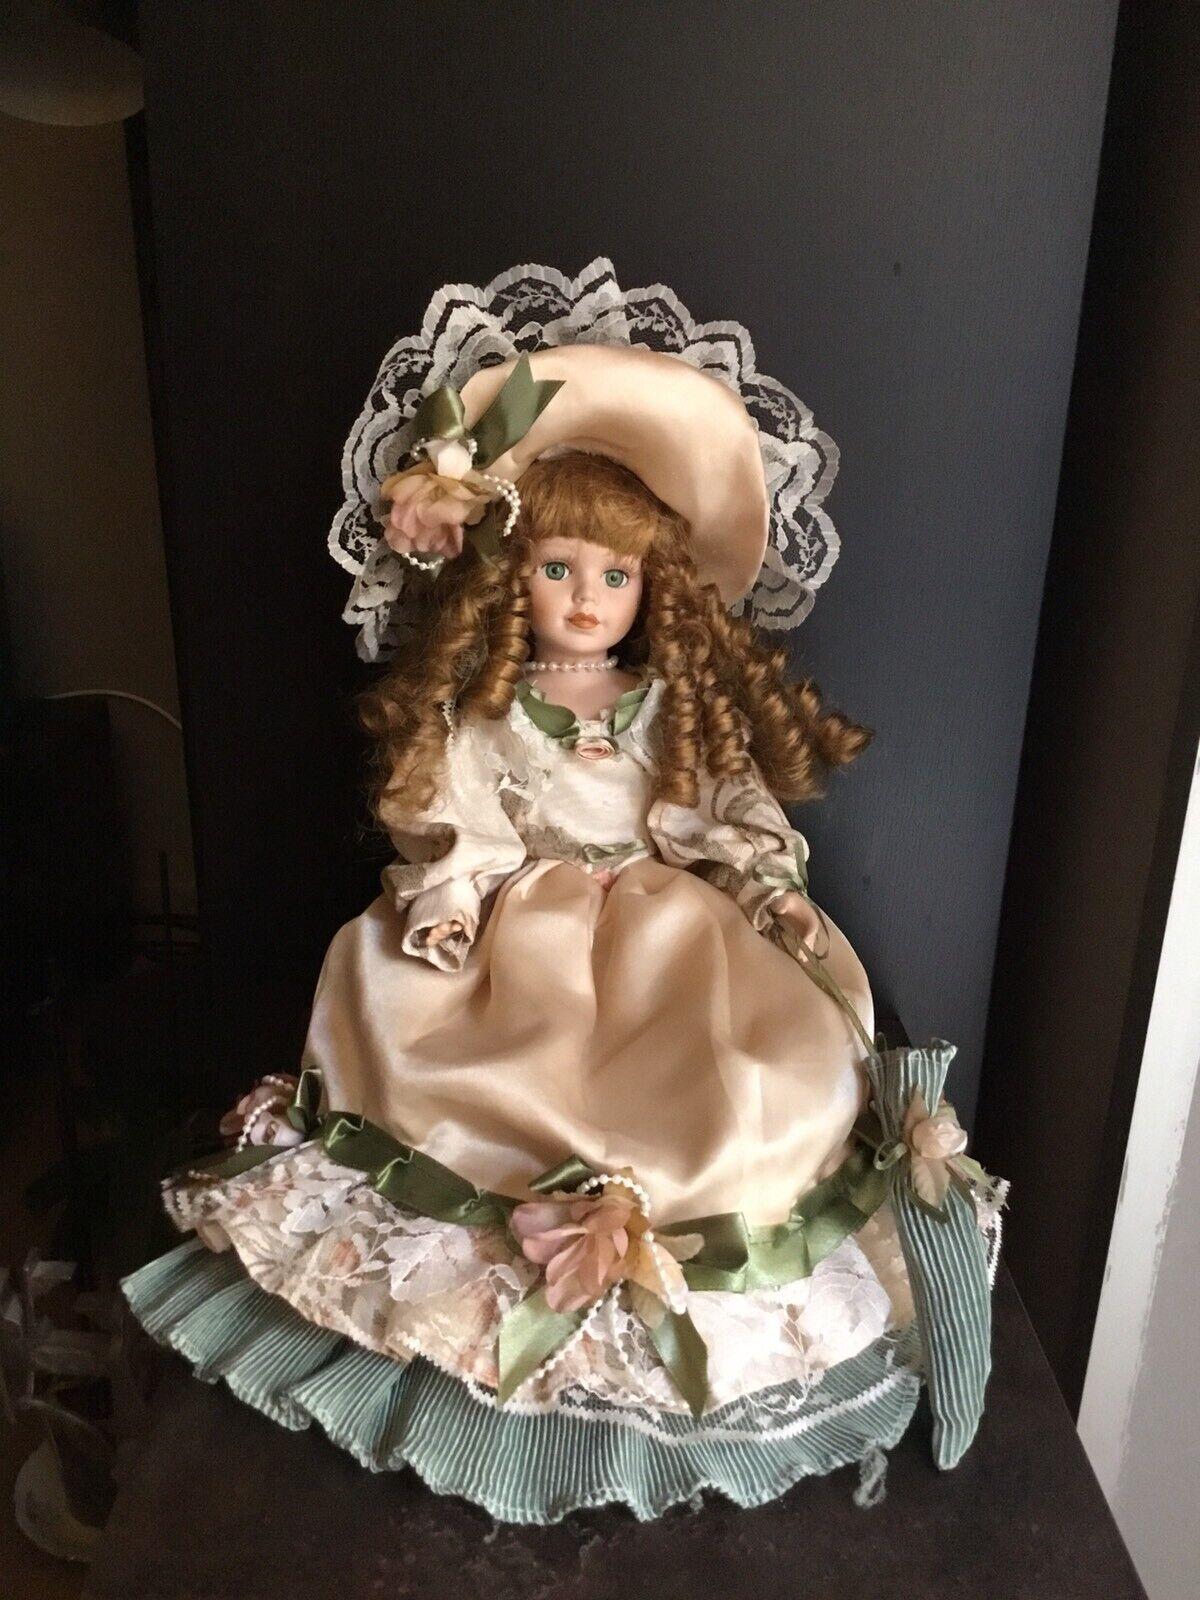 Bambola Porcellana Biscuit Fatta A Mano In Italia Italian Biscuit Doll